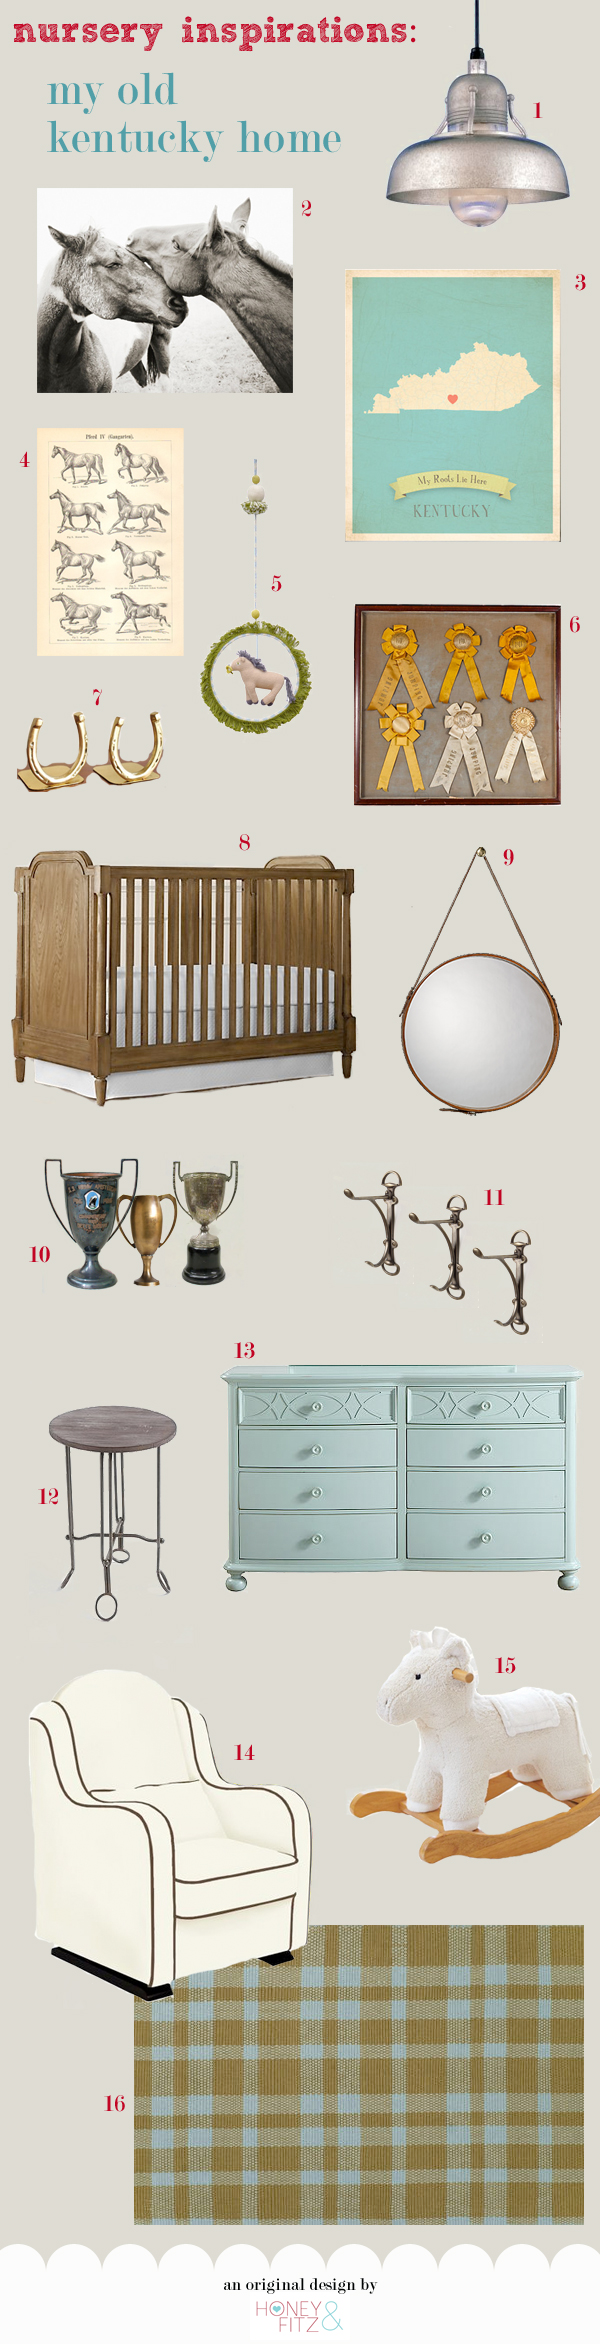 nursery-inspirations-my-old-kentucky-home